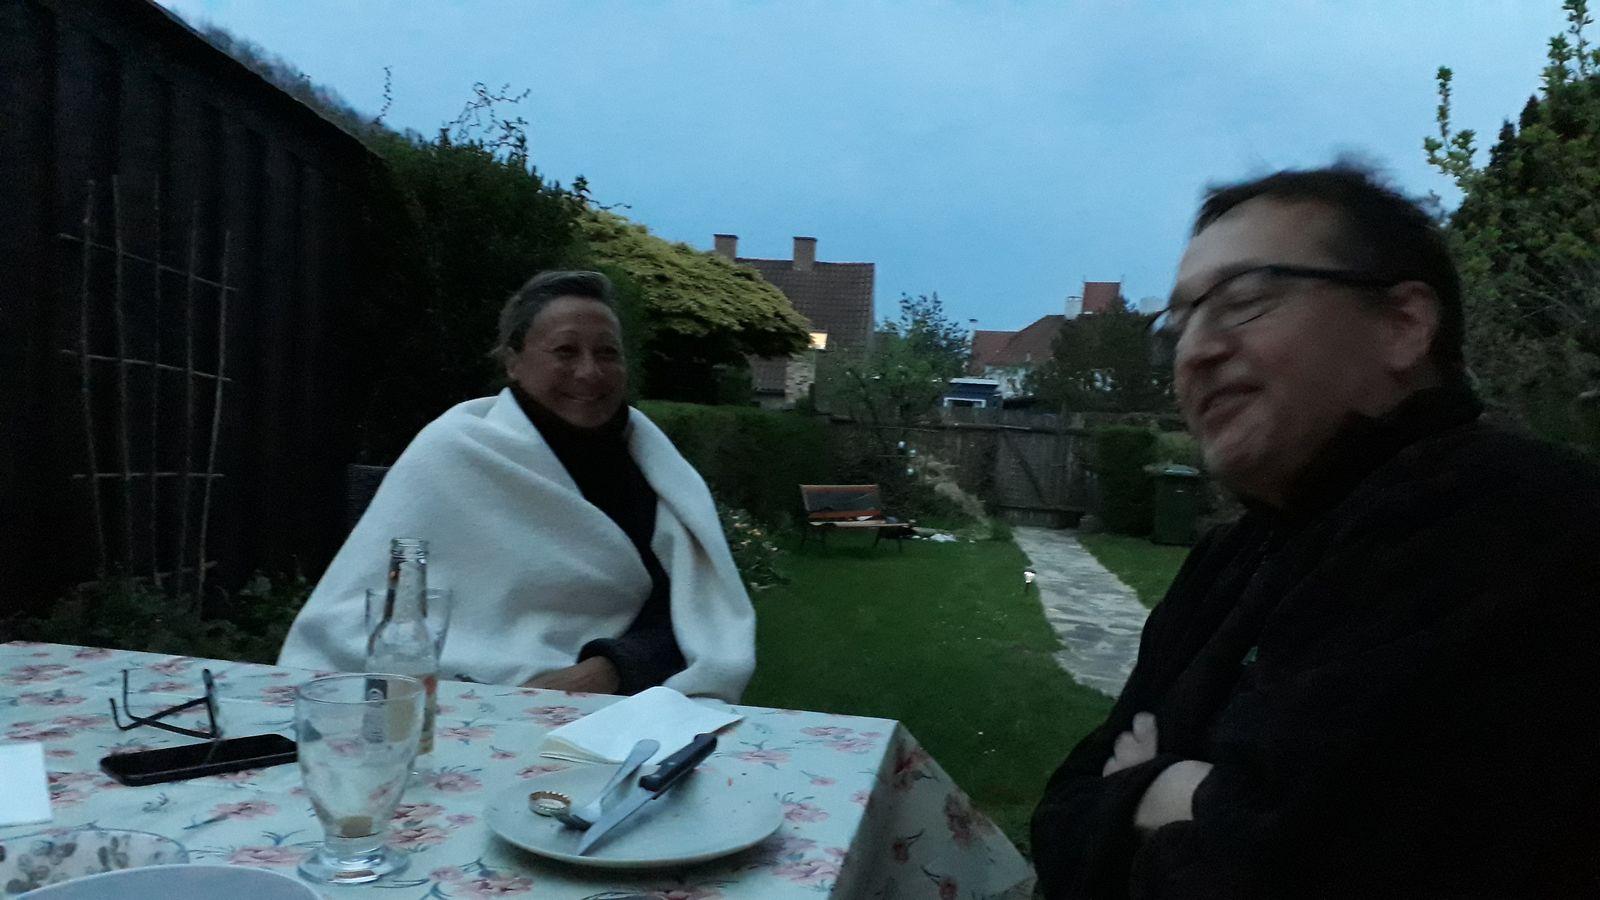 2019-04-28-2102_-_Johanne-Grønvold-Peter-Thrane